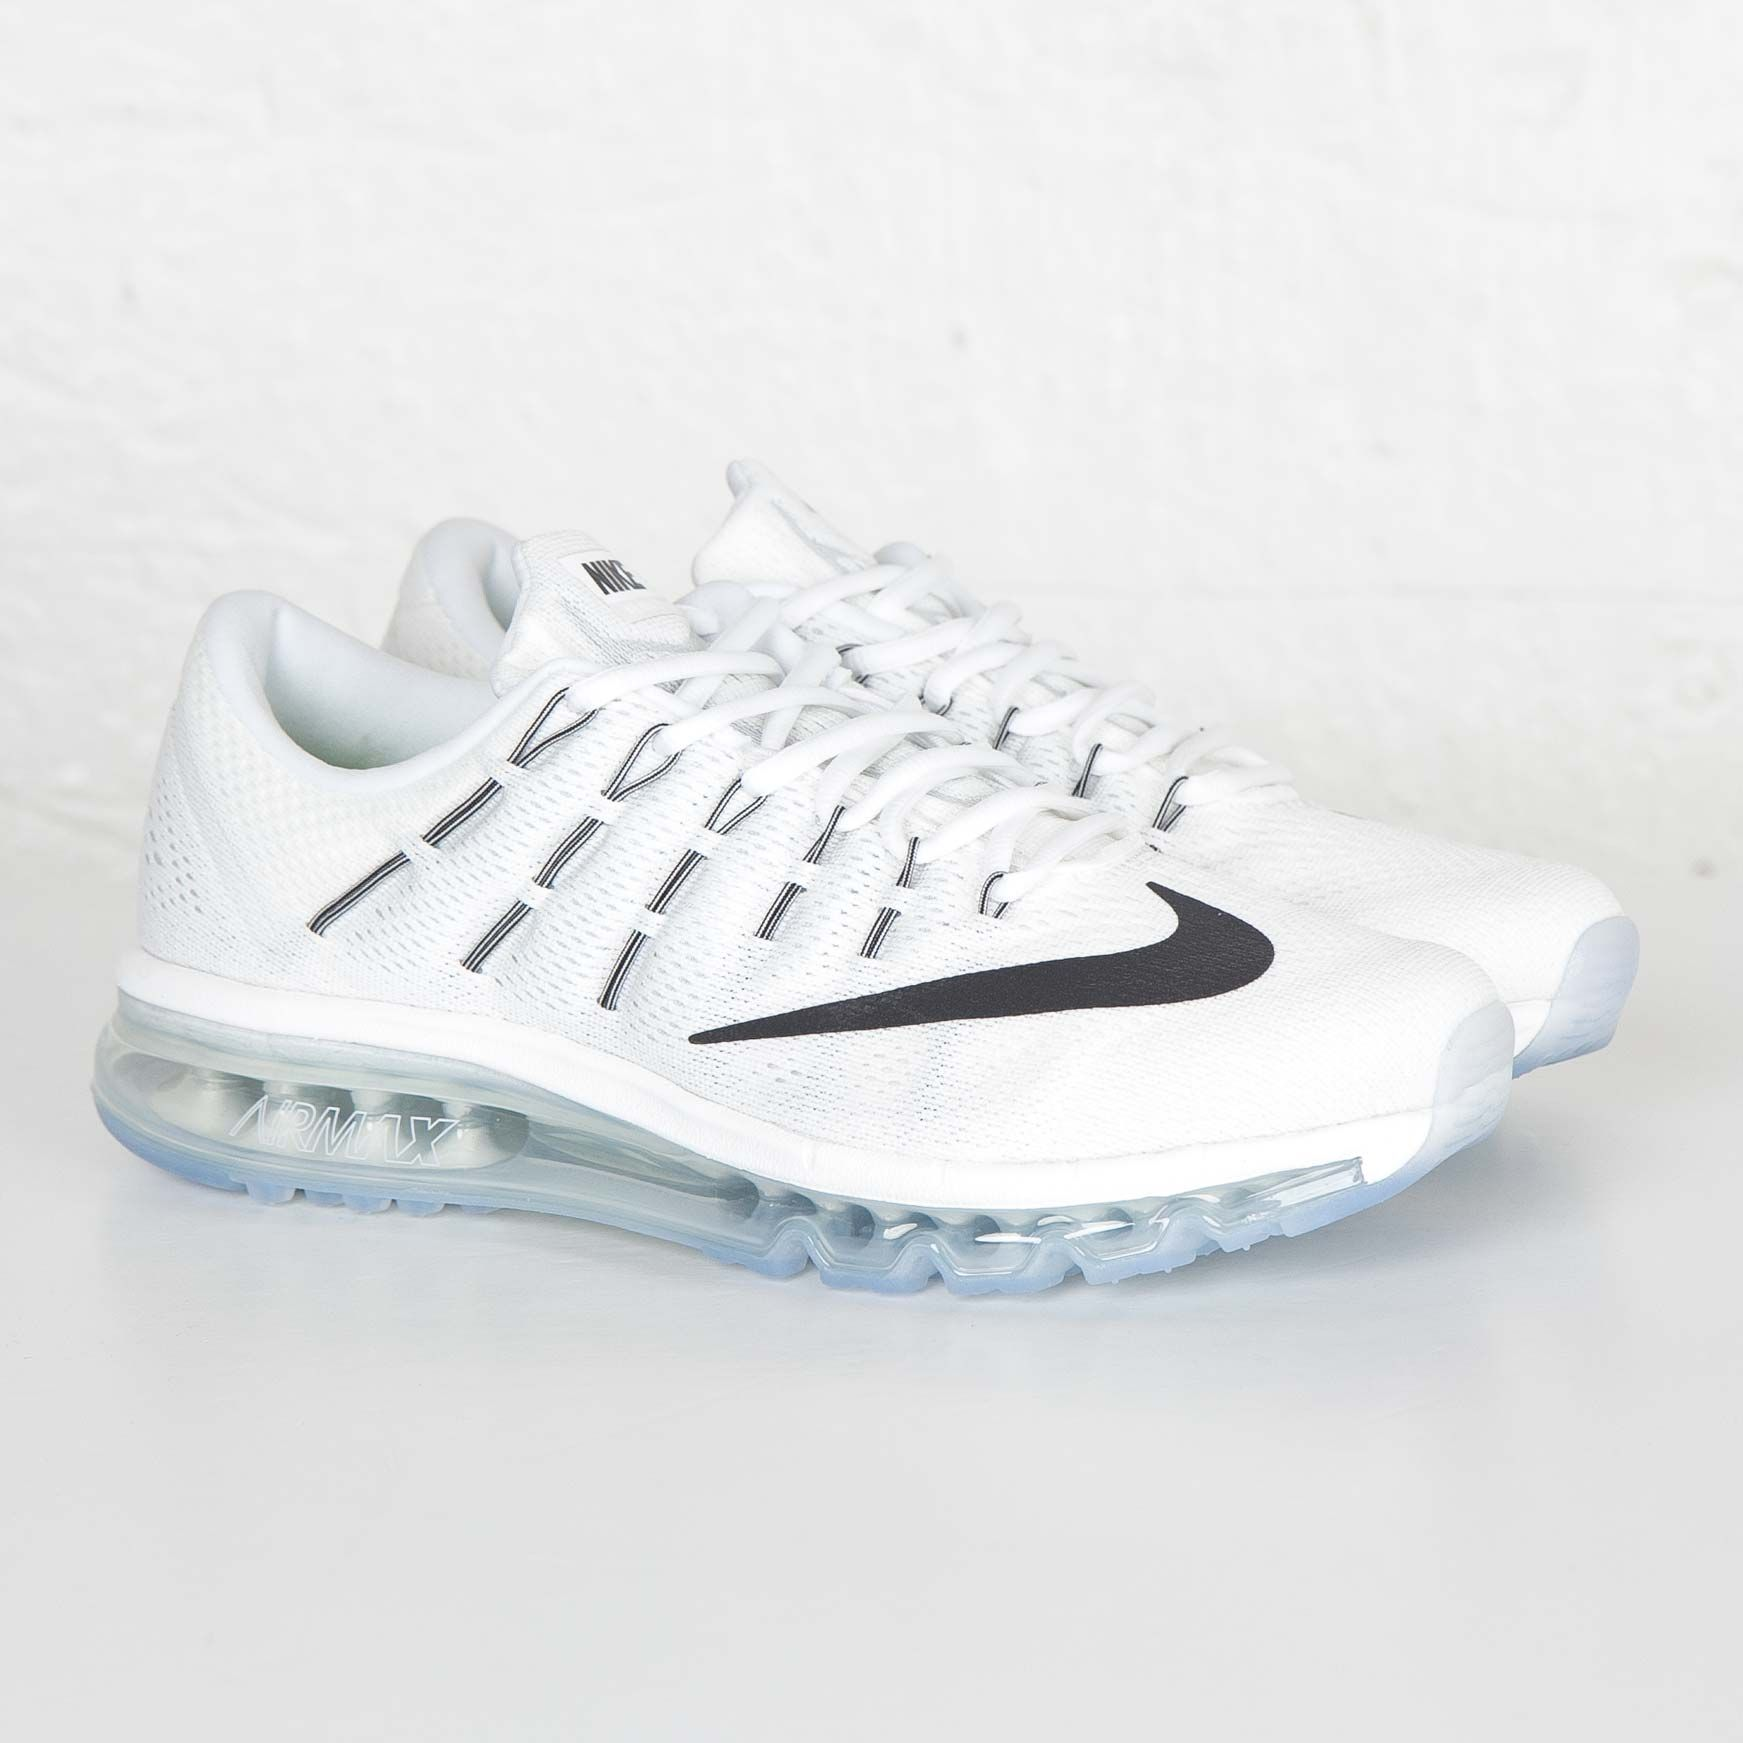 Nike Air Max 2016 | Nike air max white, Nike shoes, White nikes